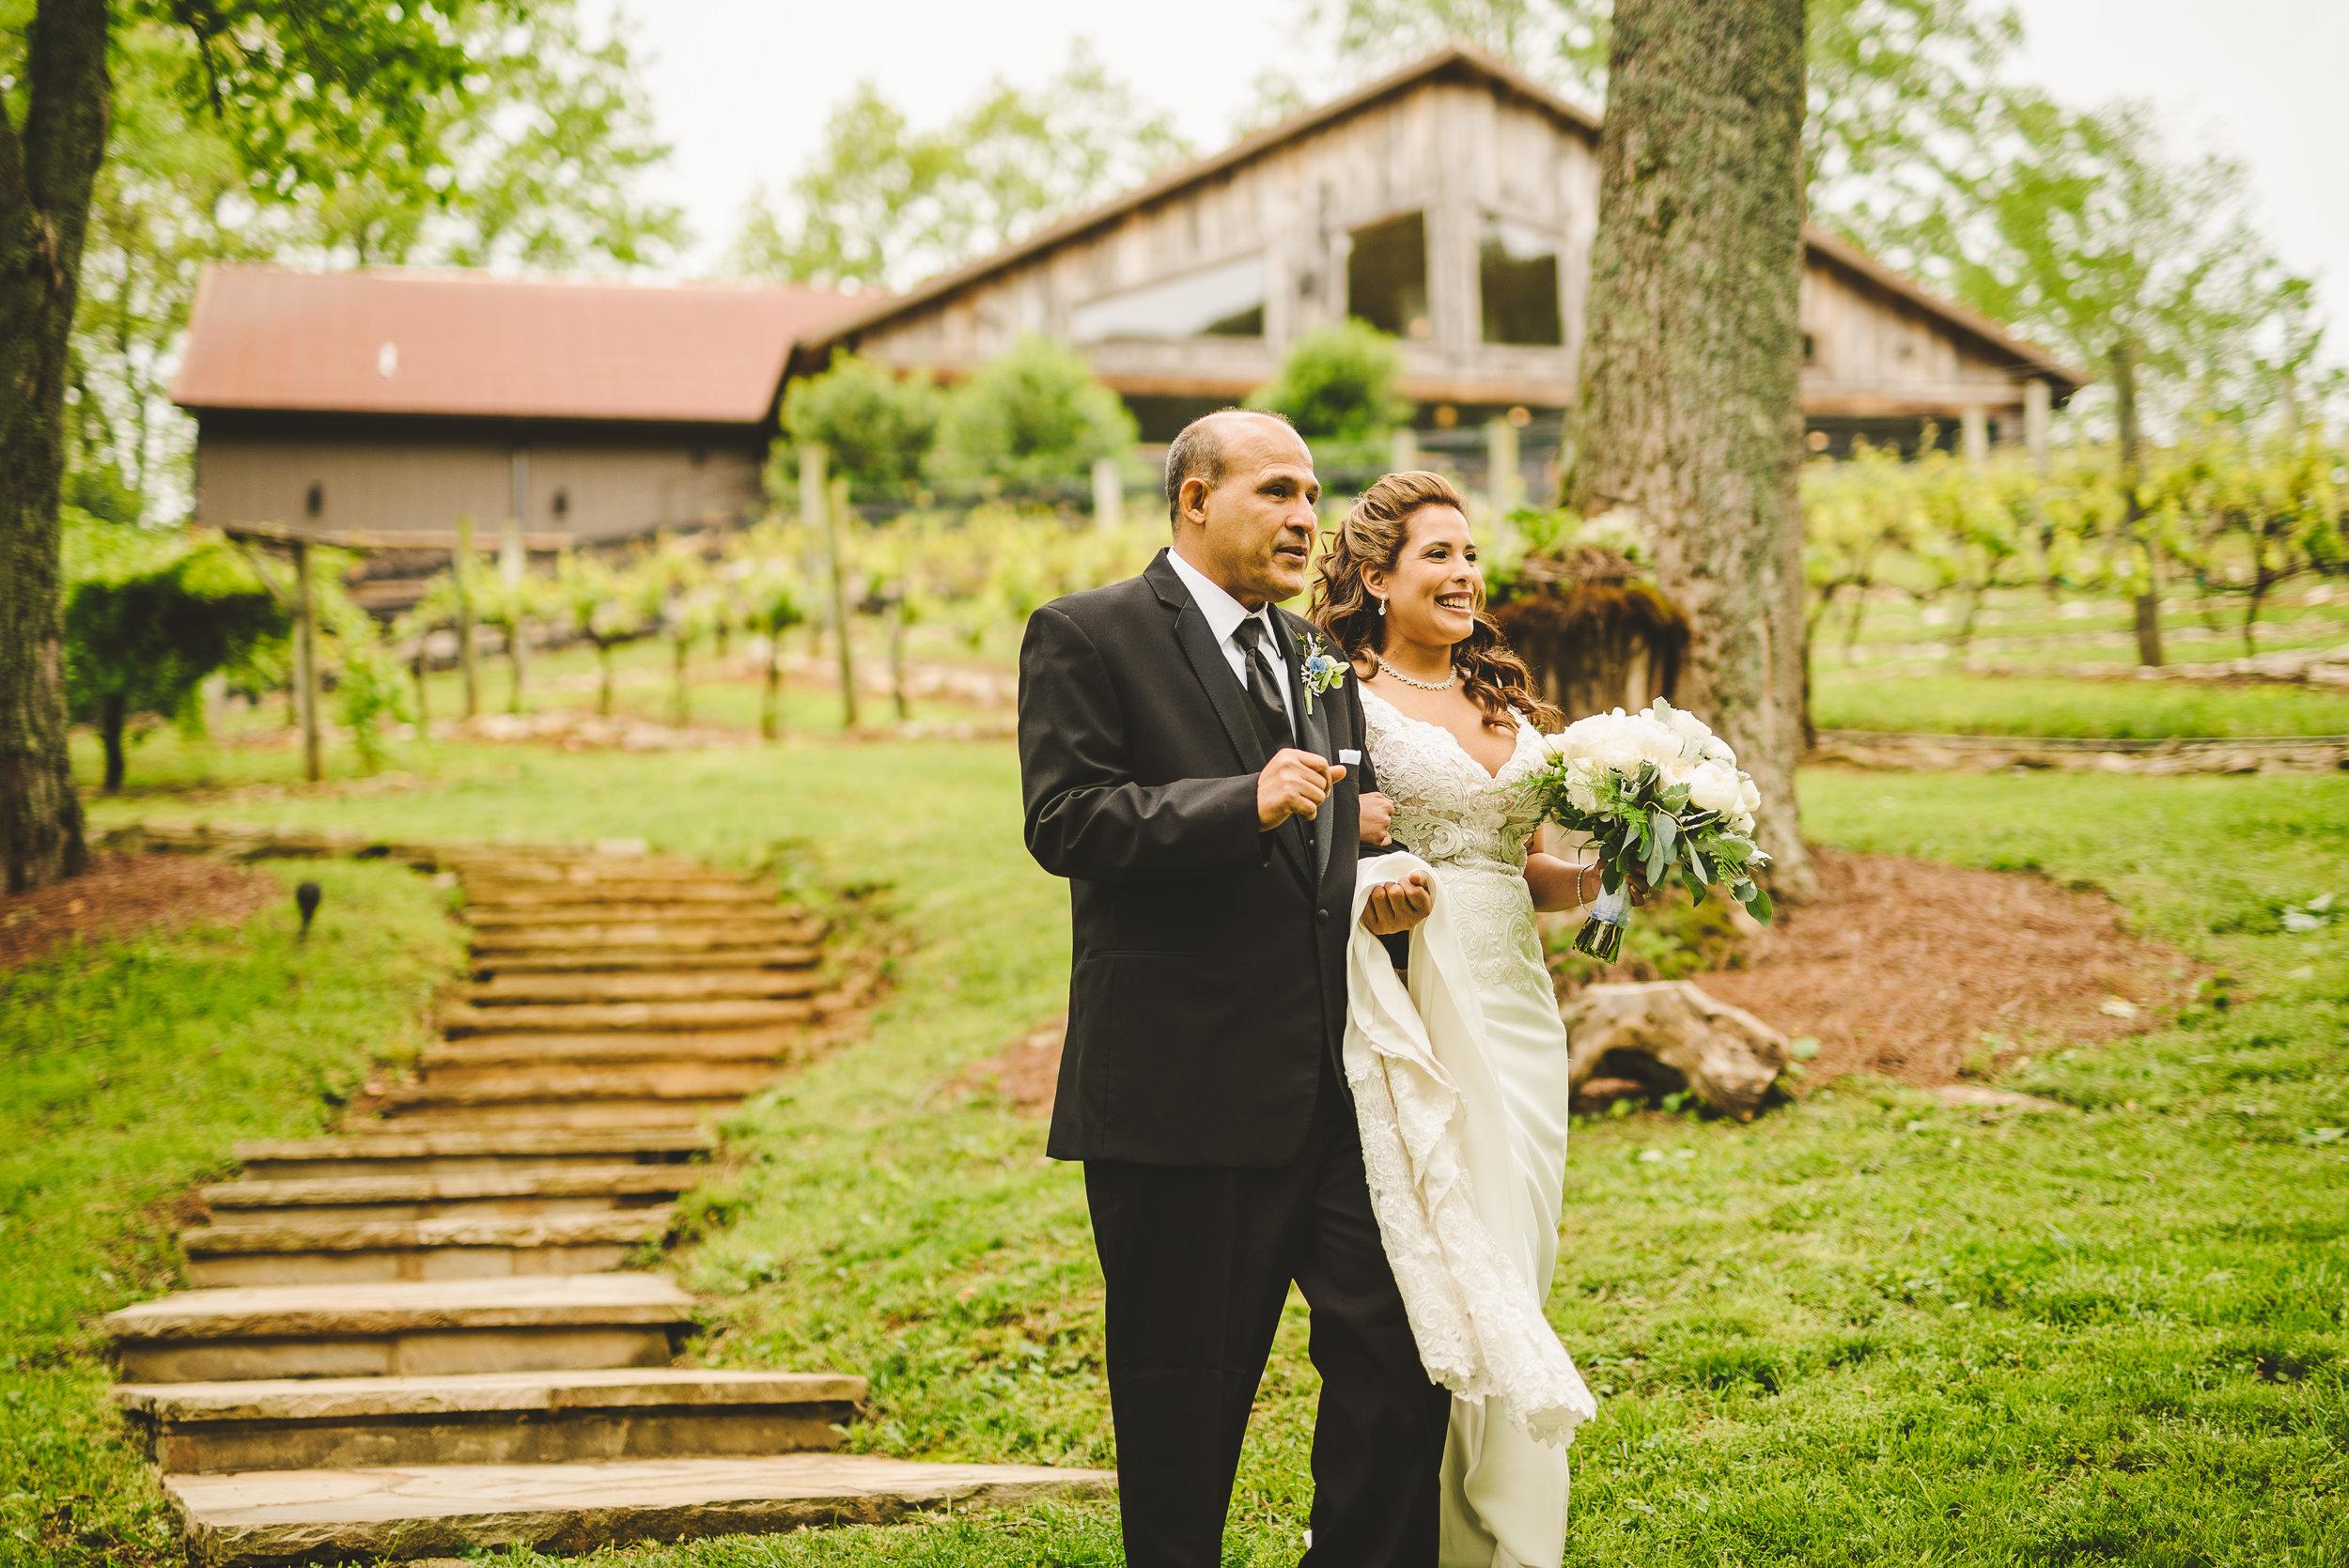 giovanna-richard-wedding-151.jpg